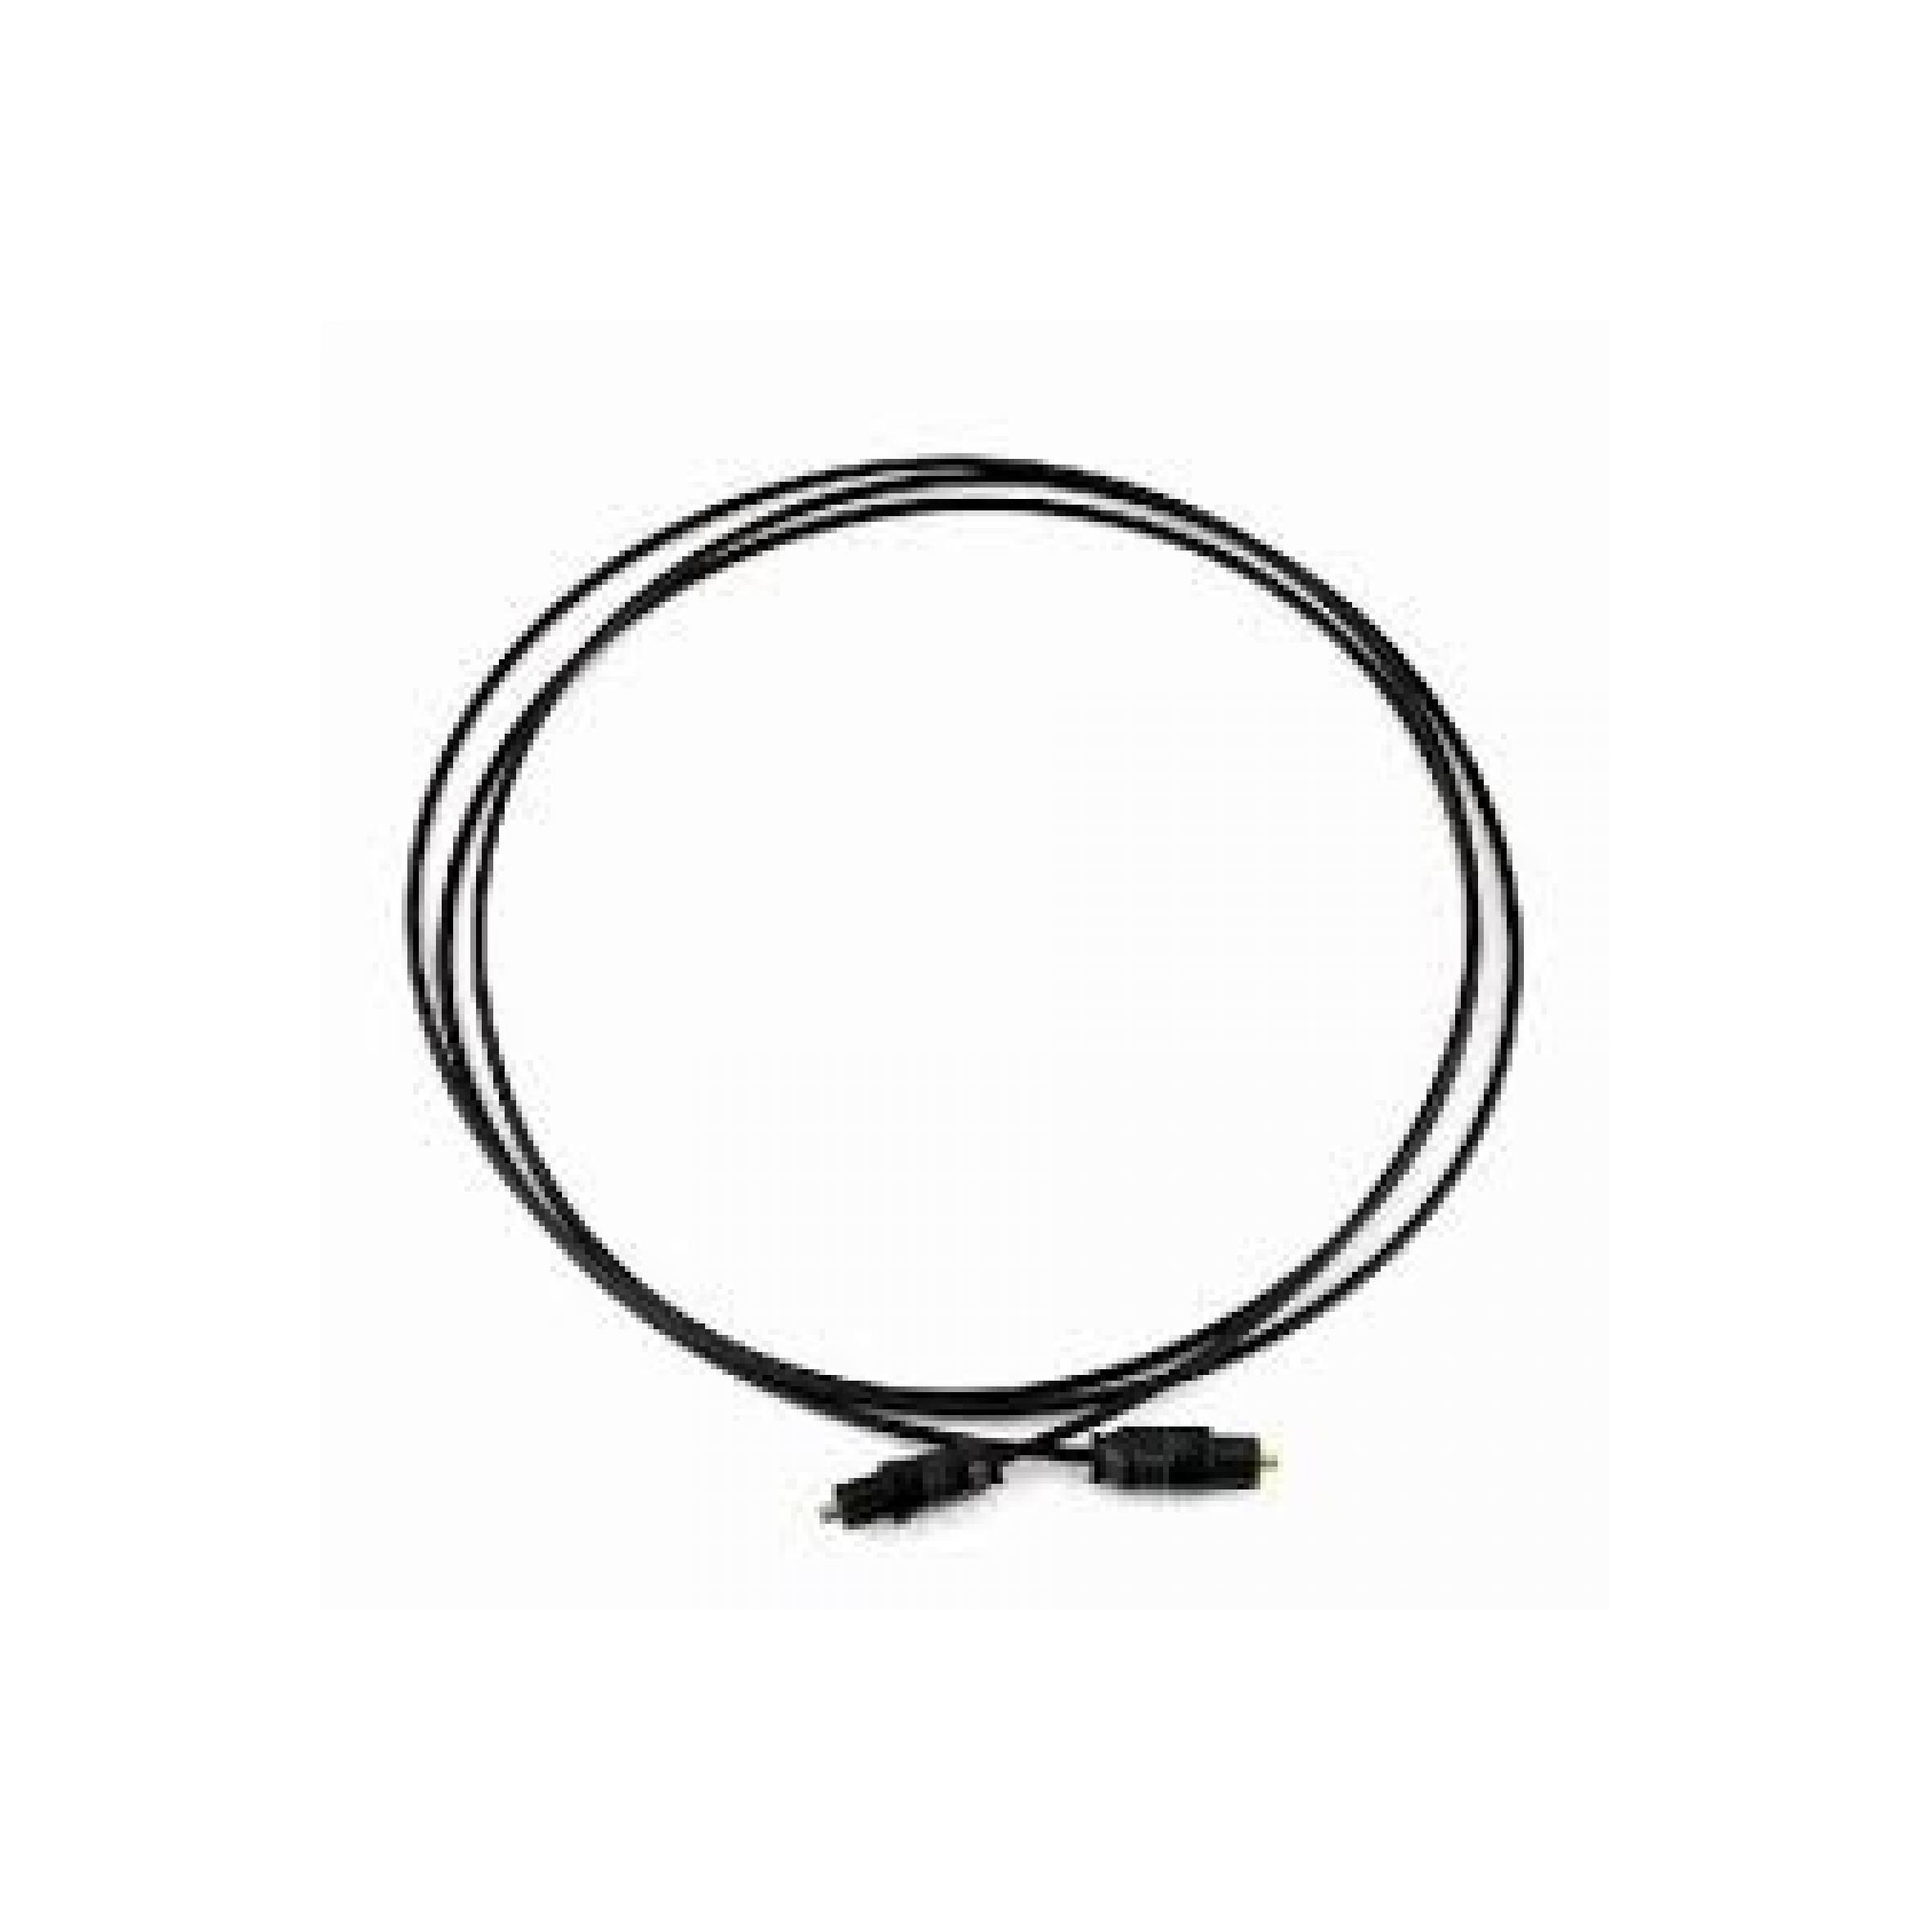 Rp 80.000. LEXCRON Fiber Optik Cable Economic 1 Meter-HitamIDR80000. Rp 80.000. Lexcron Kabel Micro USB Jelly Round Fast Charger 1 M ...